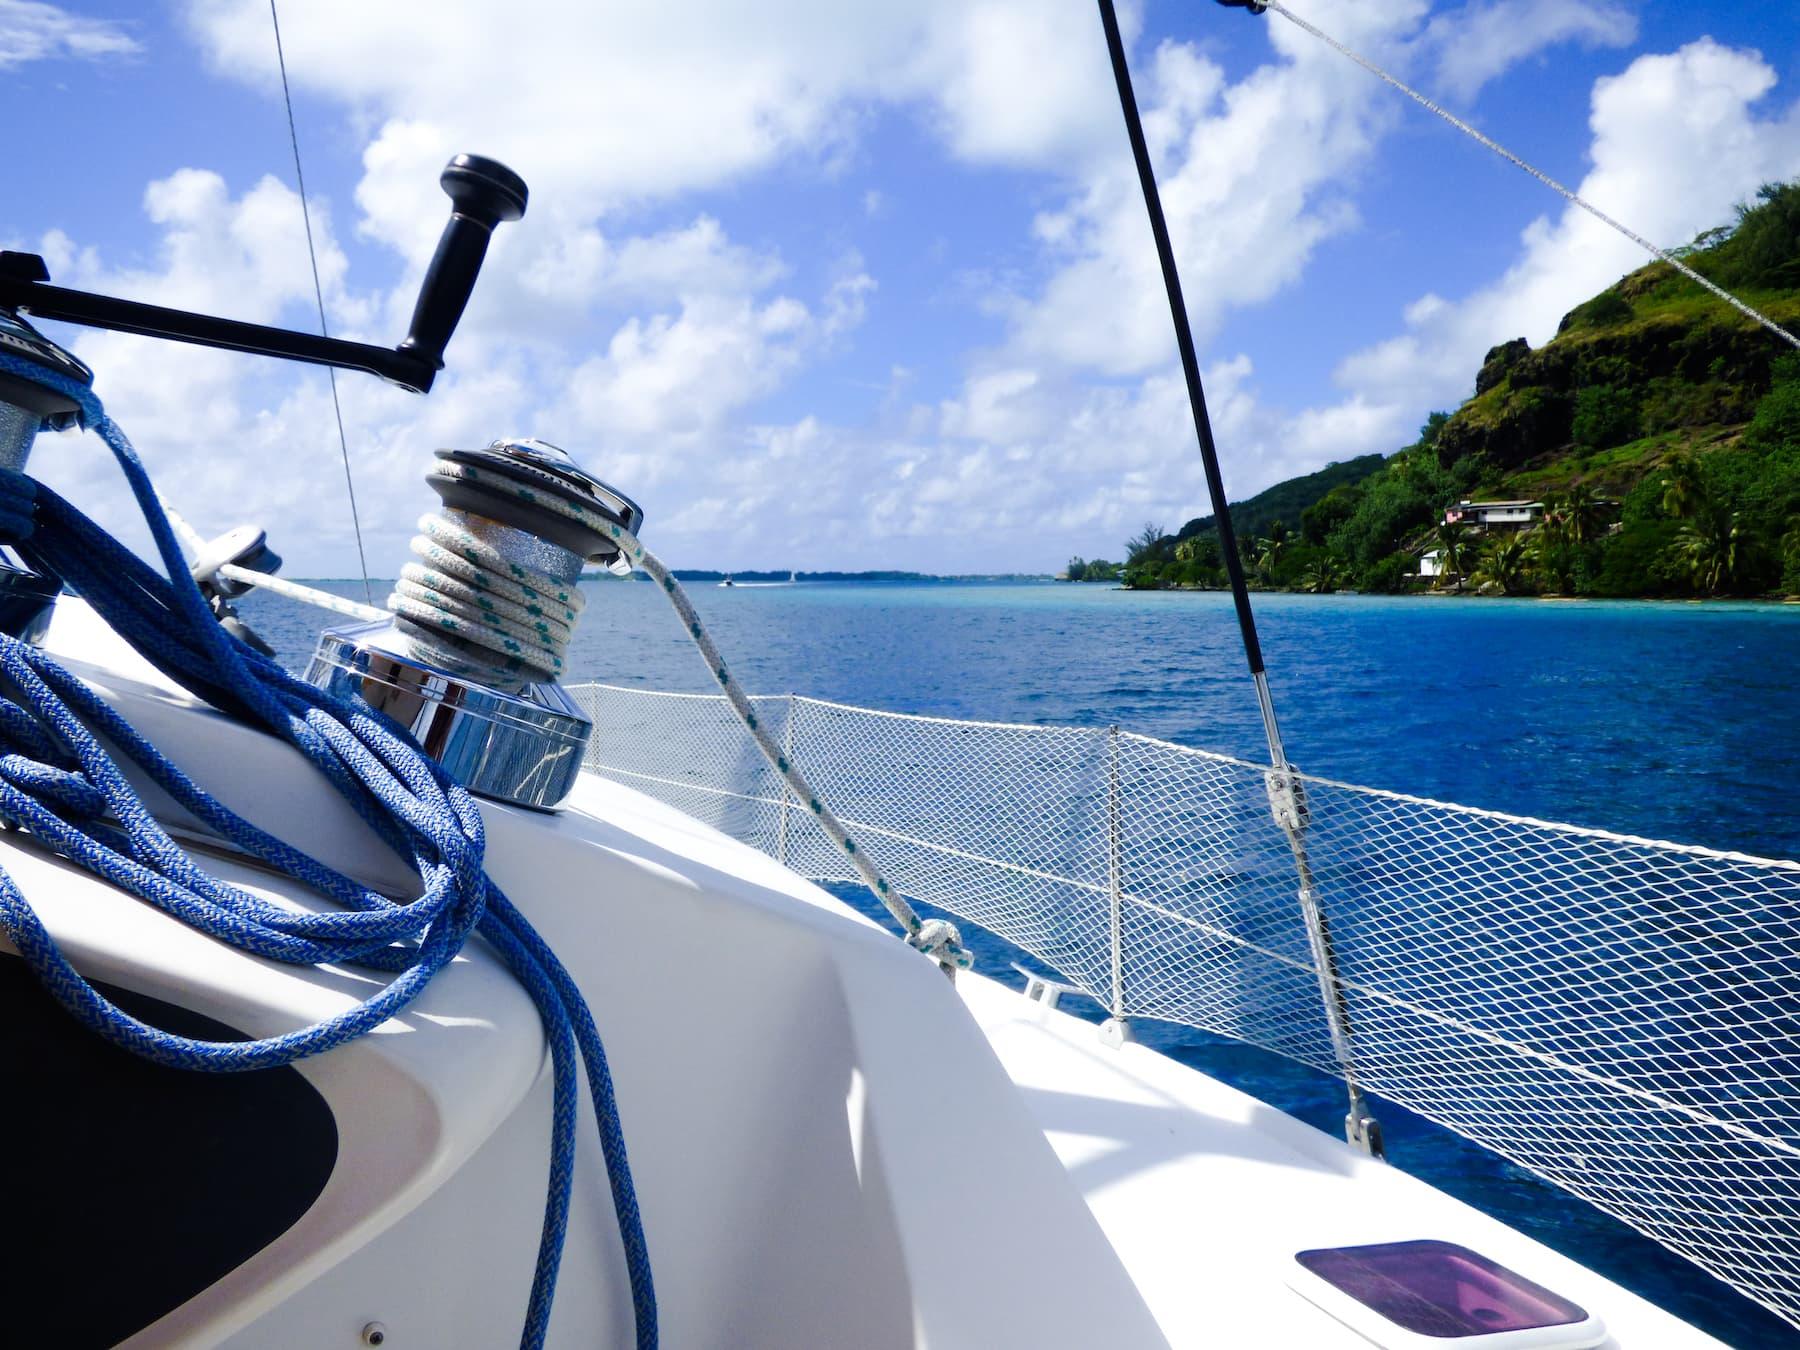 https://tahititourisme.com.br/wp-content/uploads/2017/08/bateau-tlc-modif-13.jpg